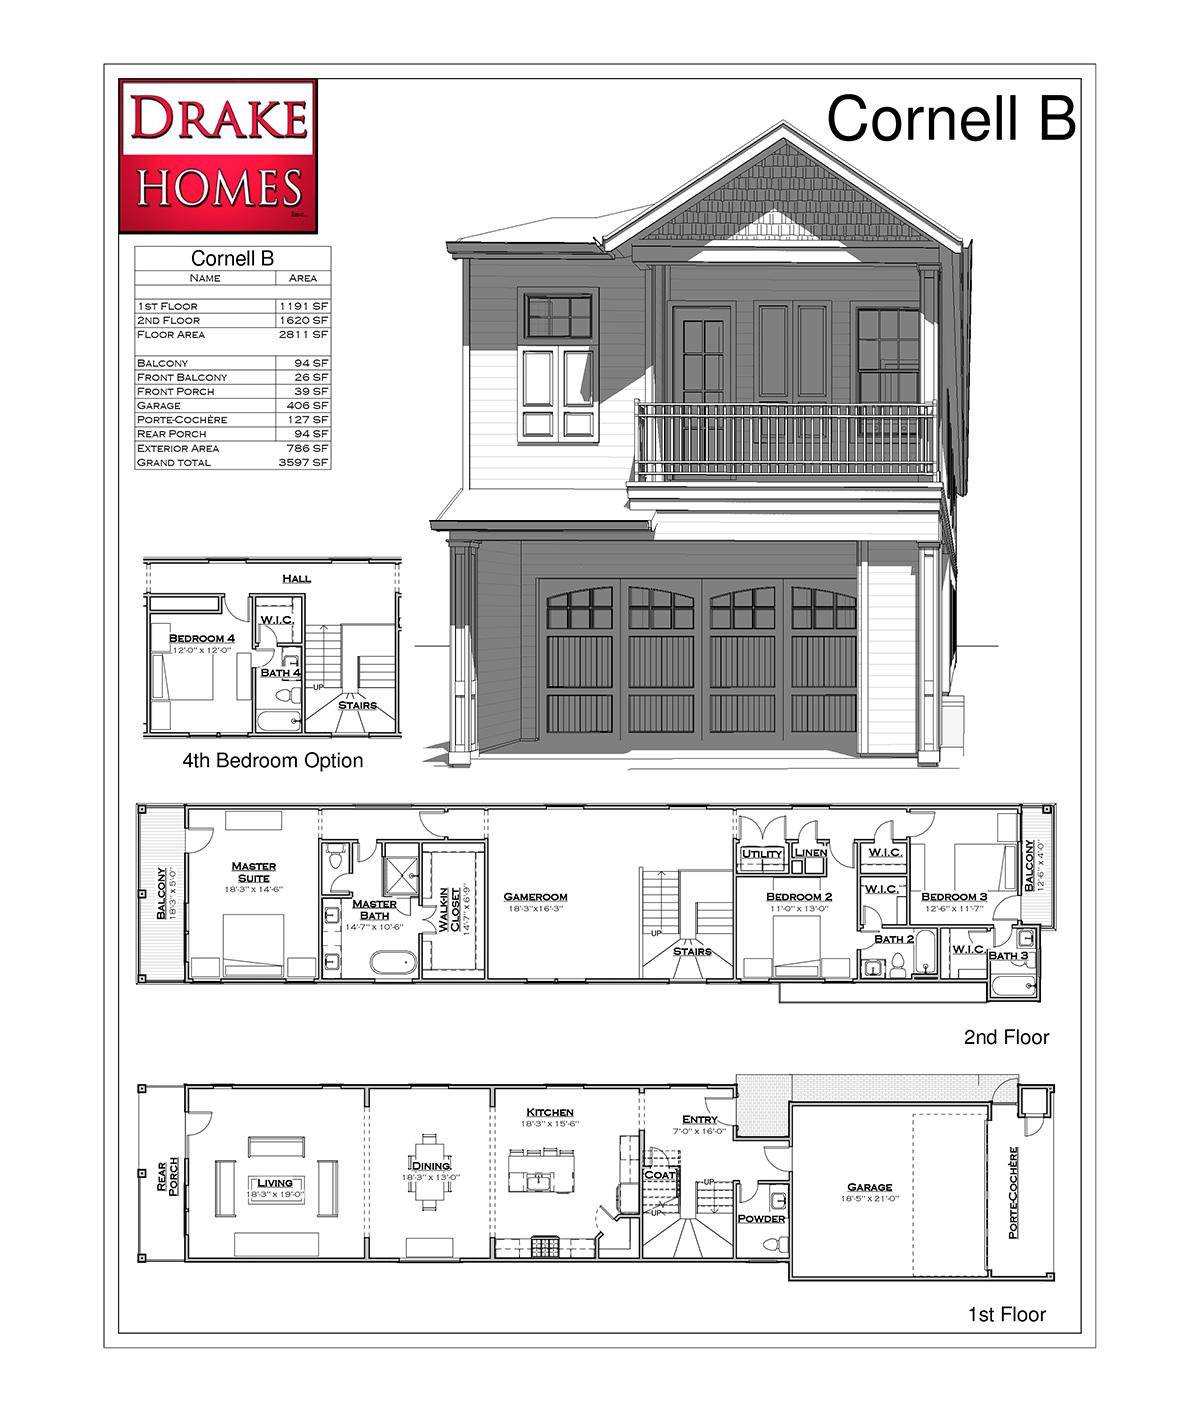 Cornell B Floor Plan